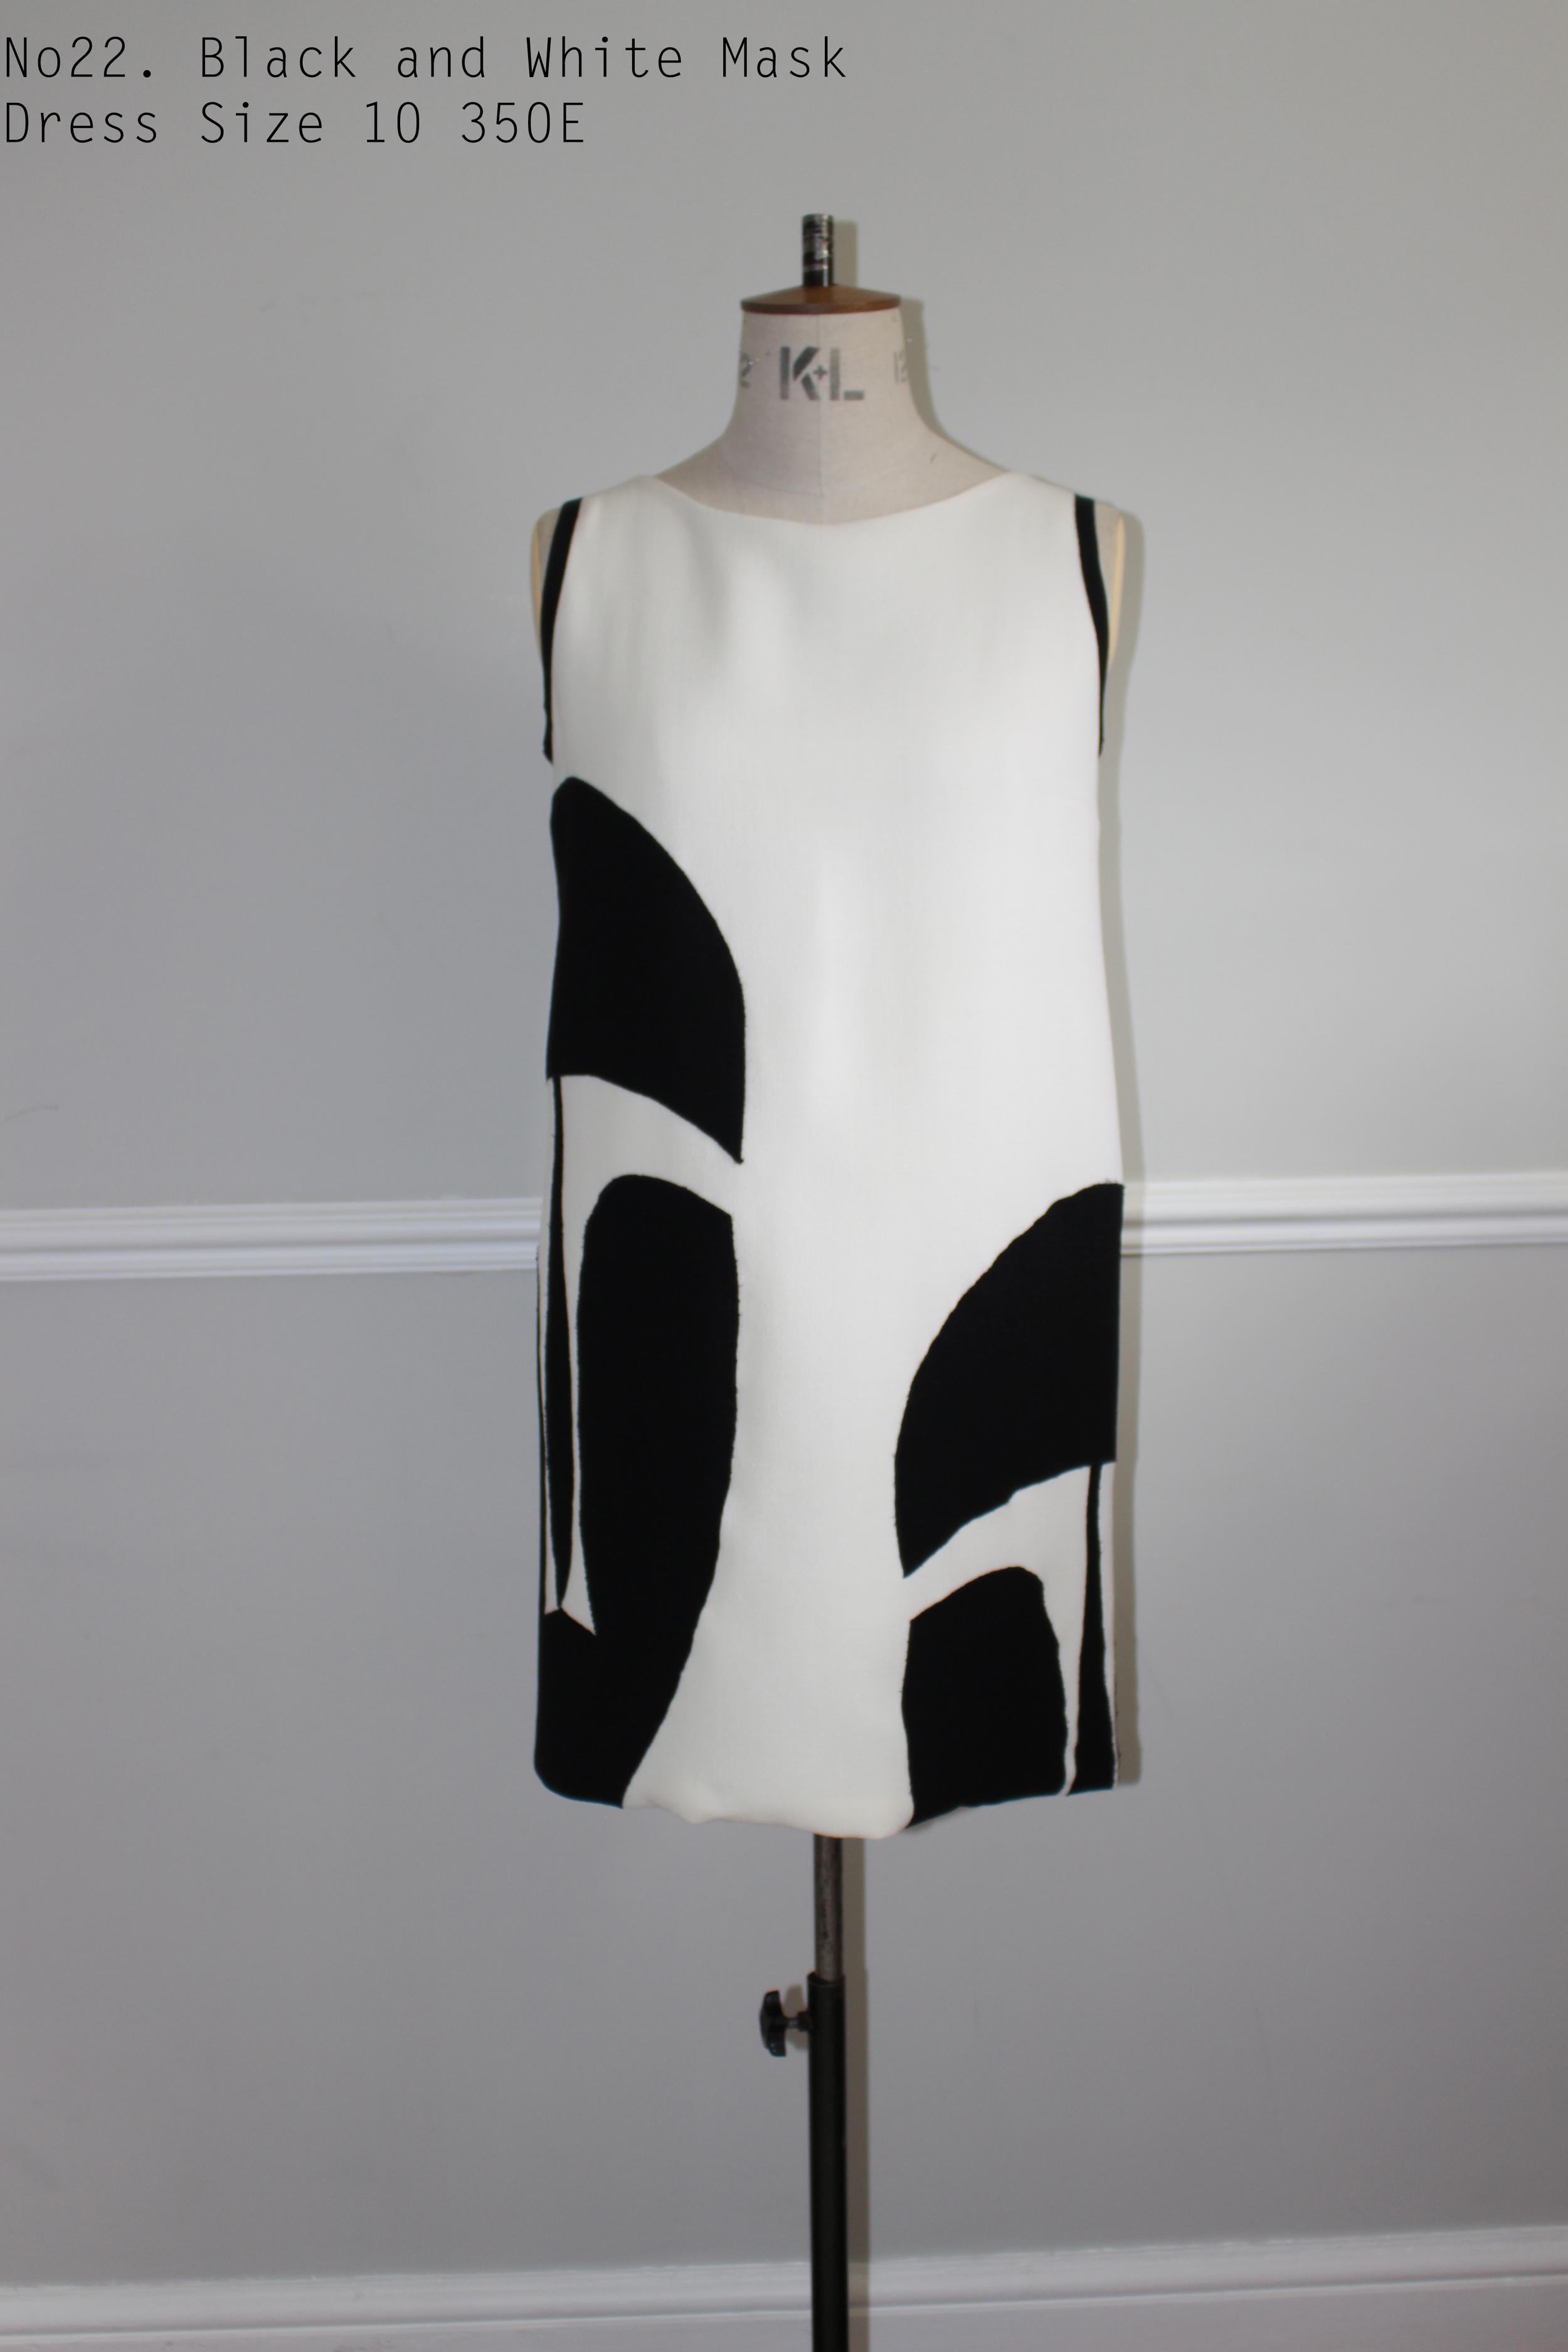 No22. Black and White Mask Dress Size 10 350E.jpg